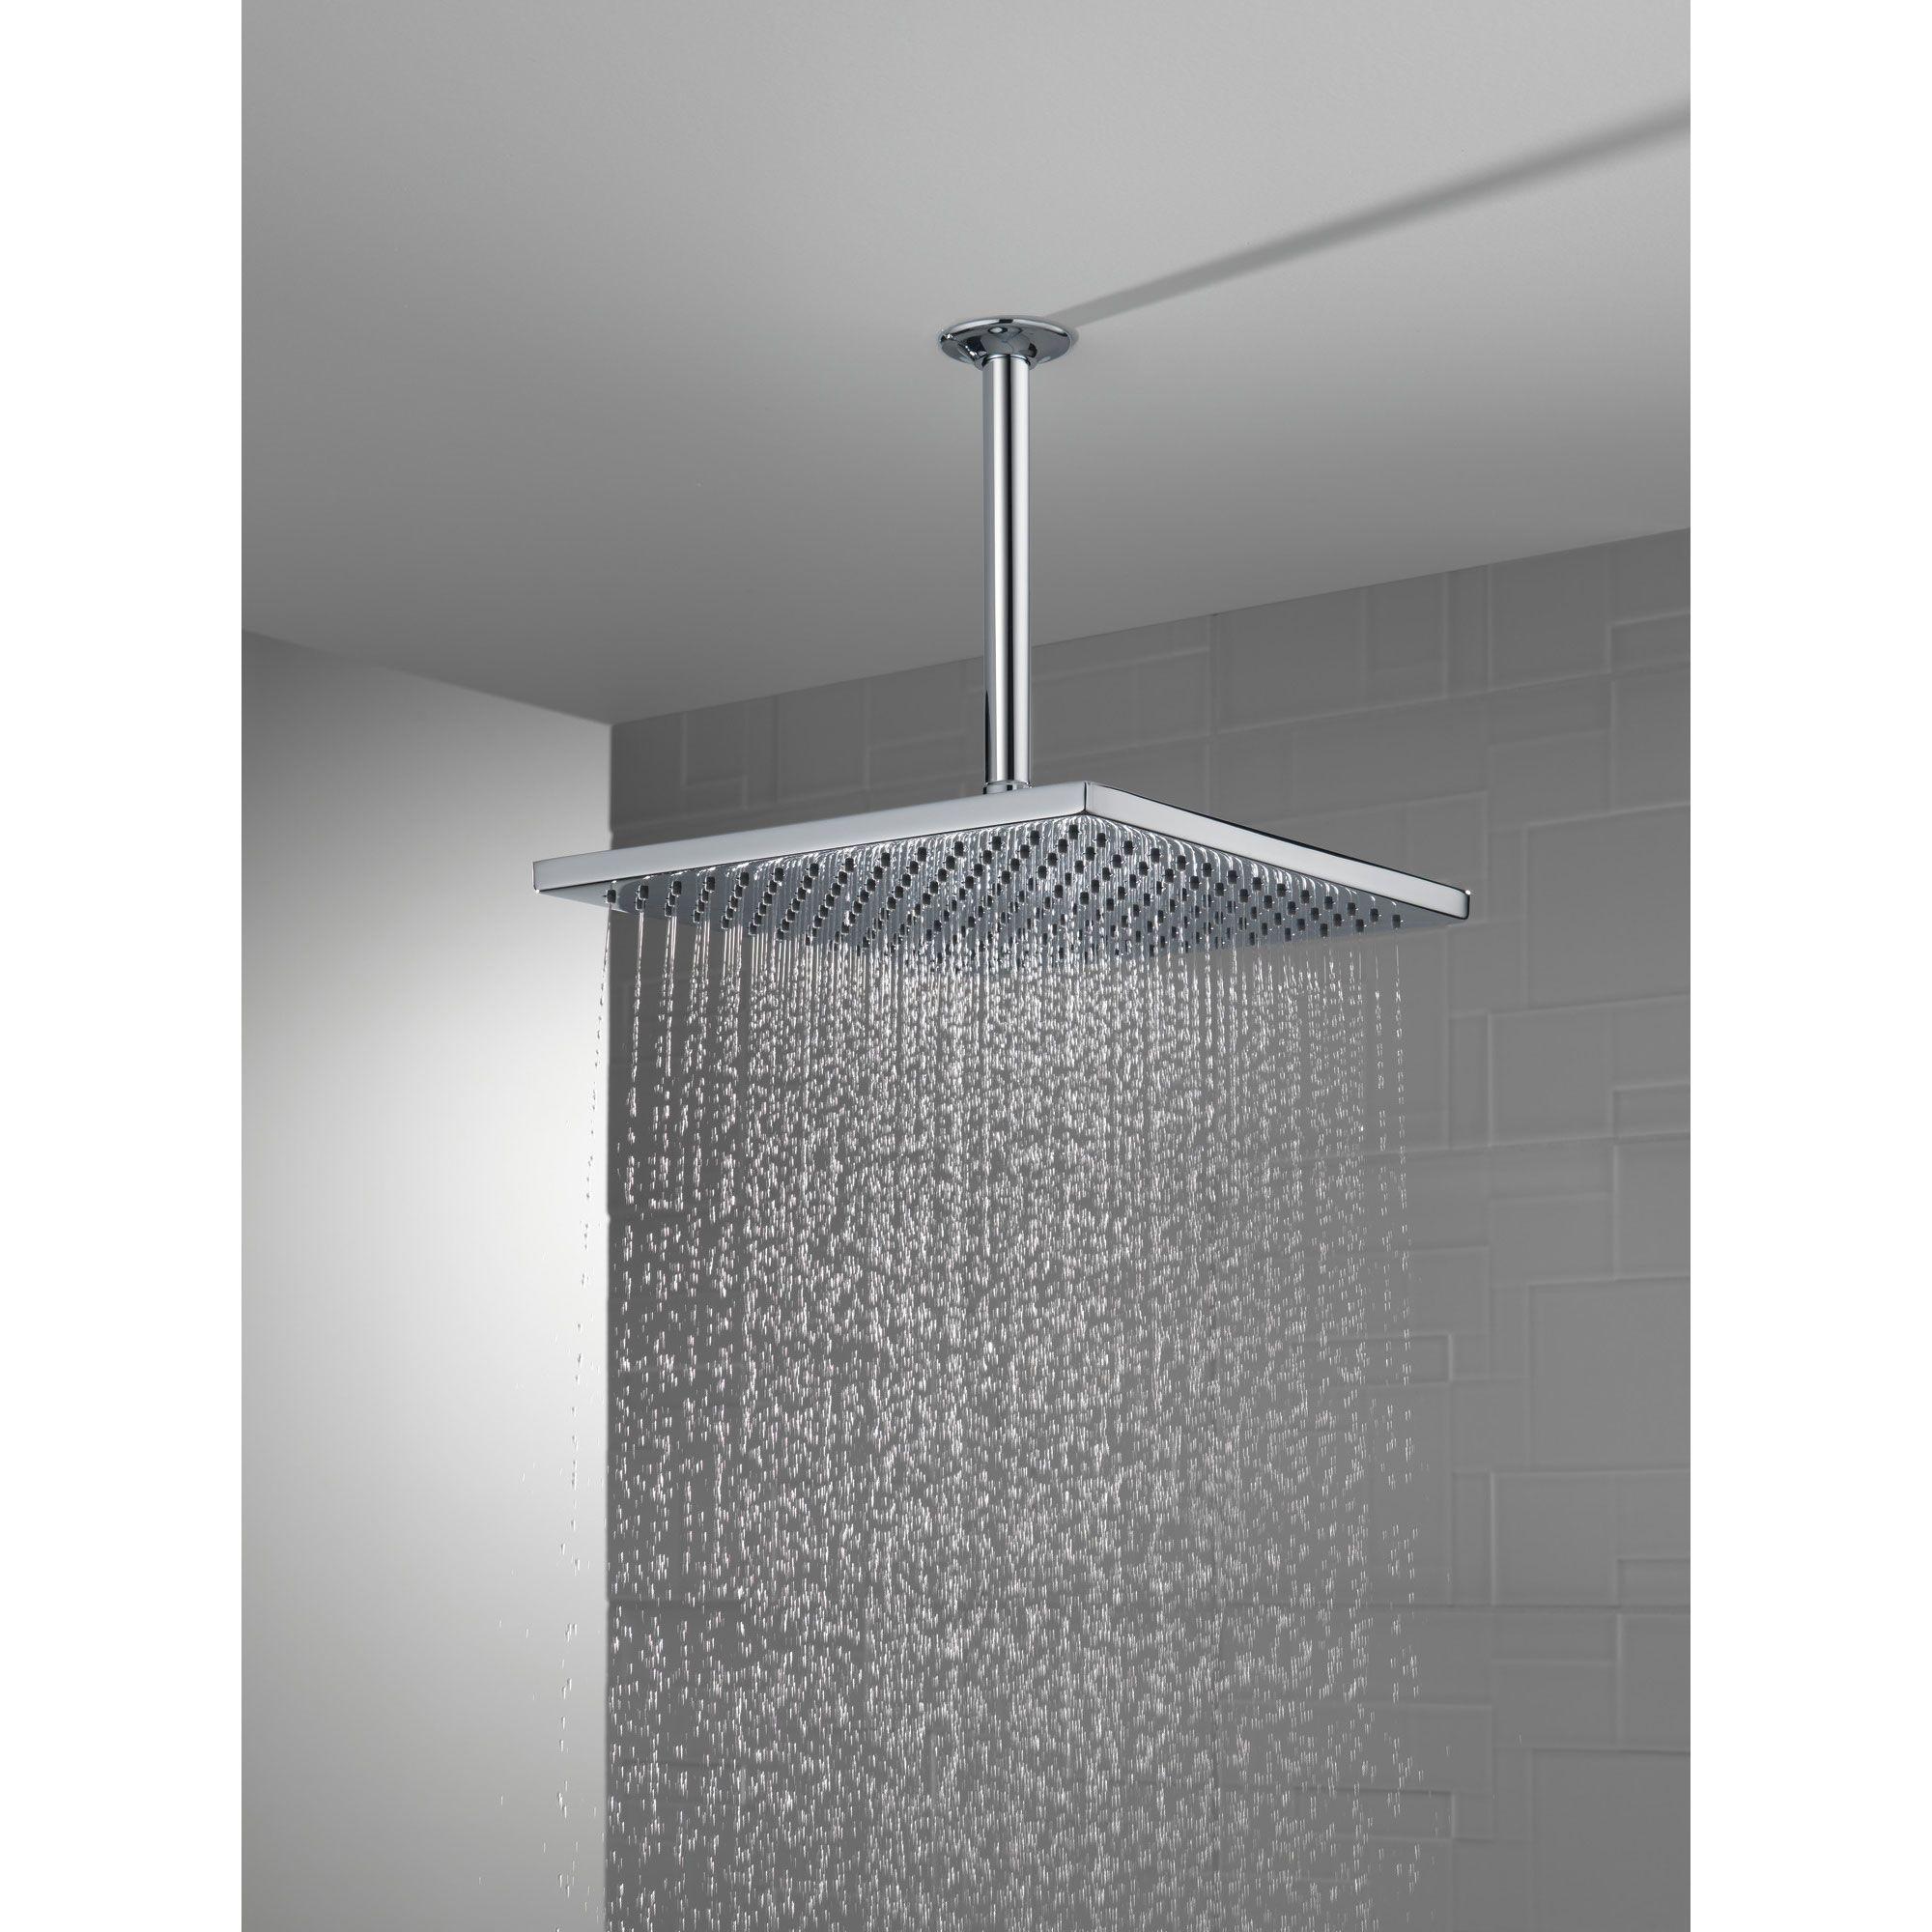 Delta Chrome Finish 11 3 4 Large Square 2 5 Gpm Single Setting Modern Metal Raincan Shower Head D5215925 In 2021 Rain Shower Head Rain Shower Shower Heads